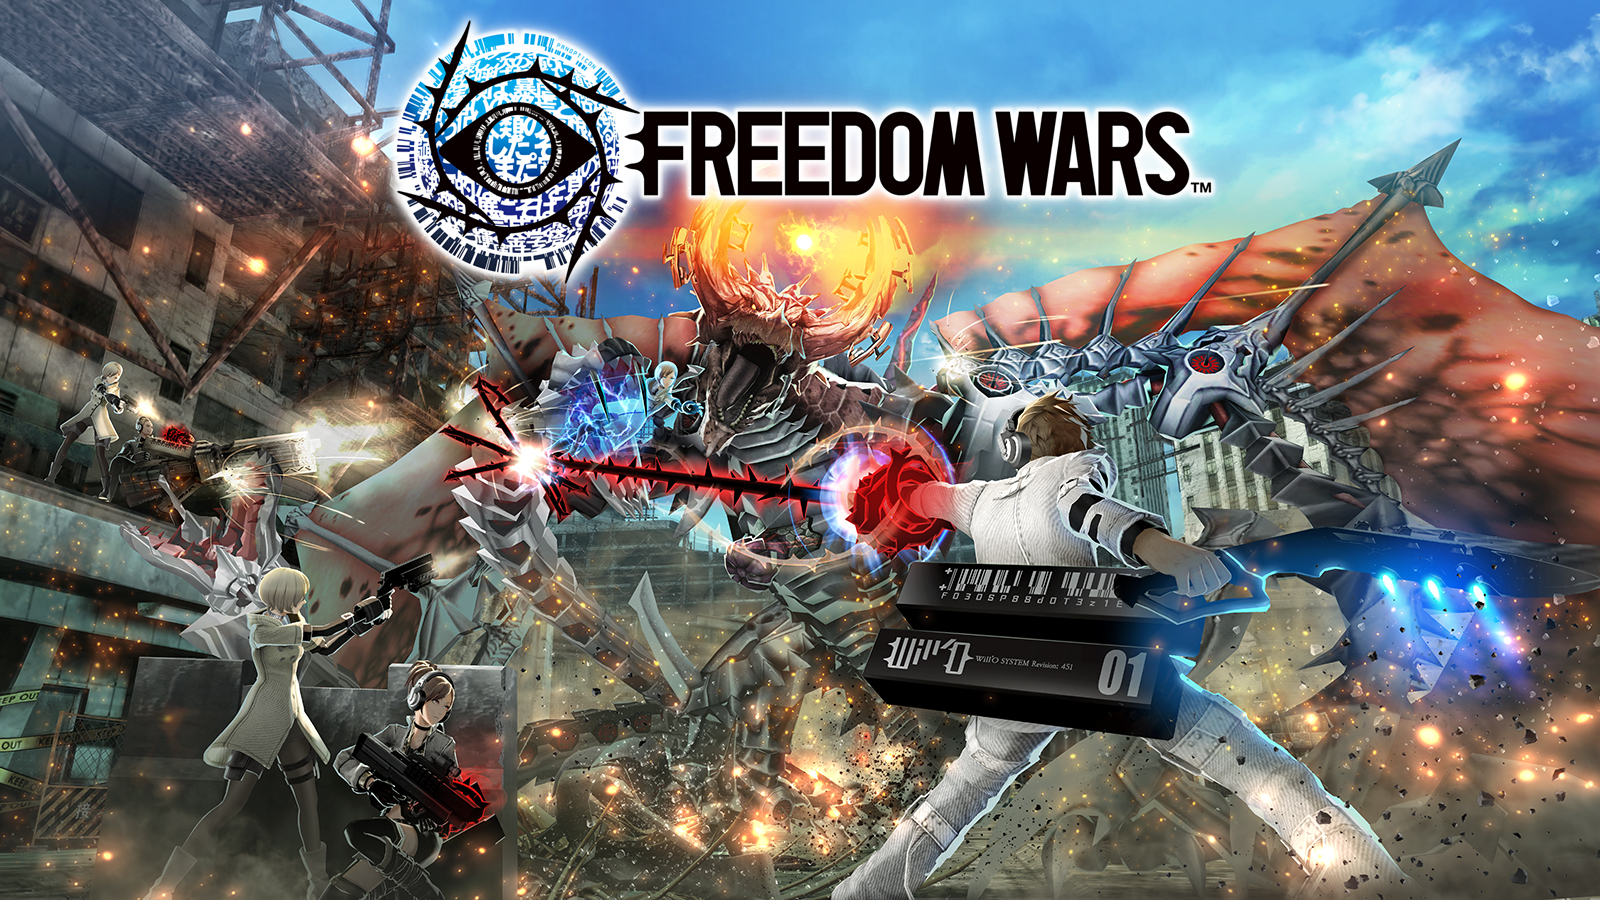 Free PS Plus December Freedom Wars